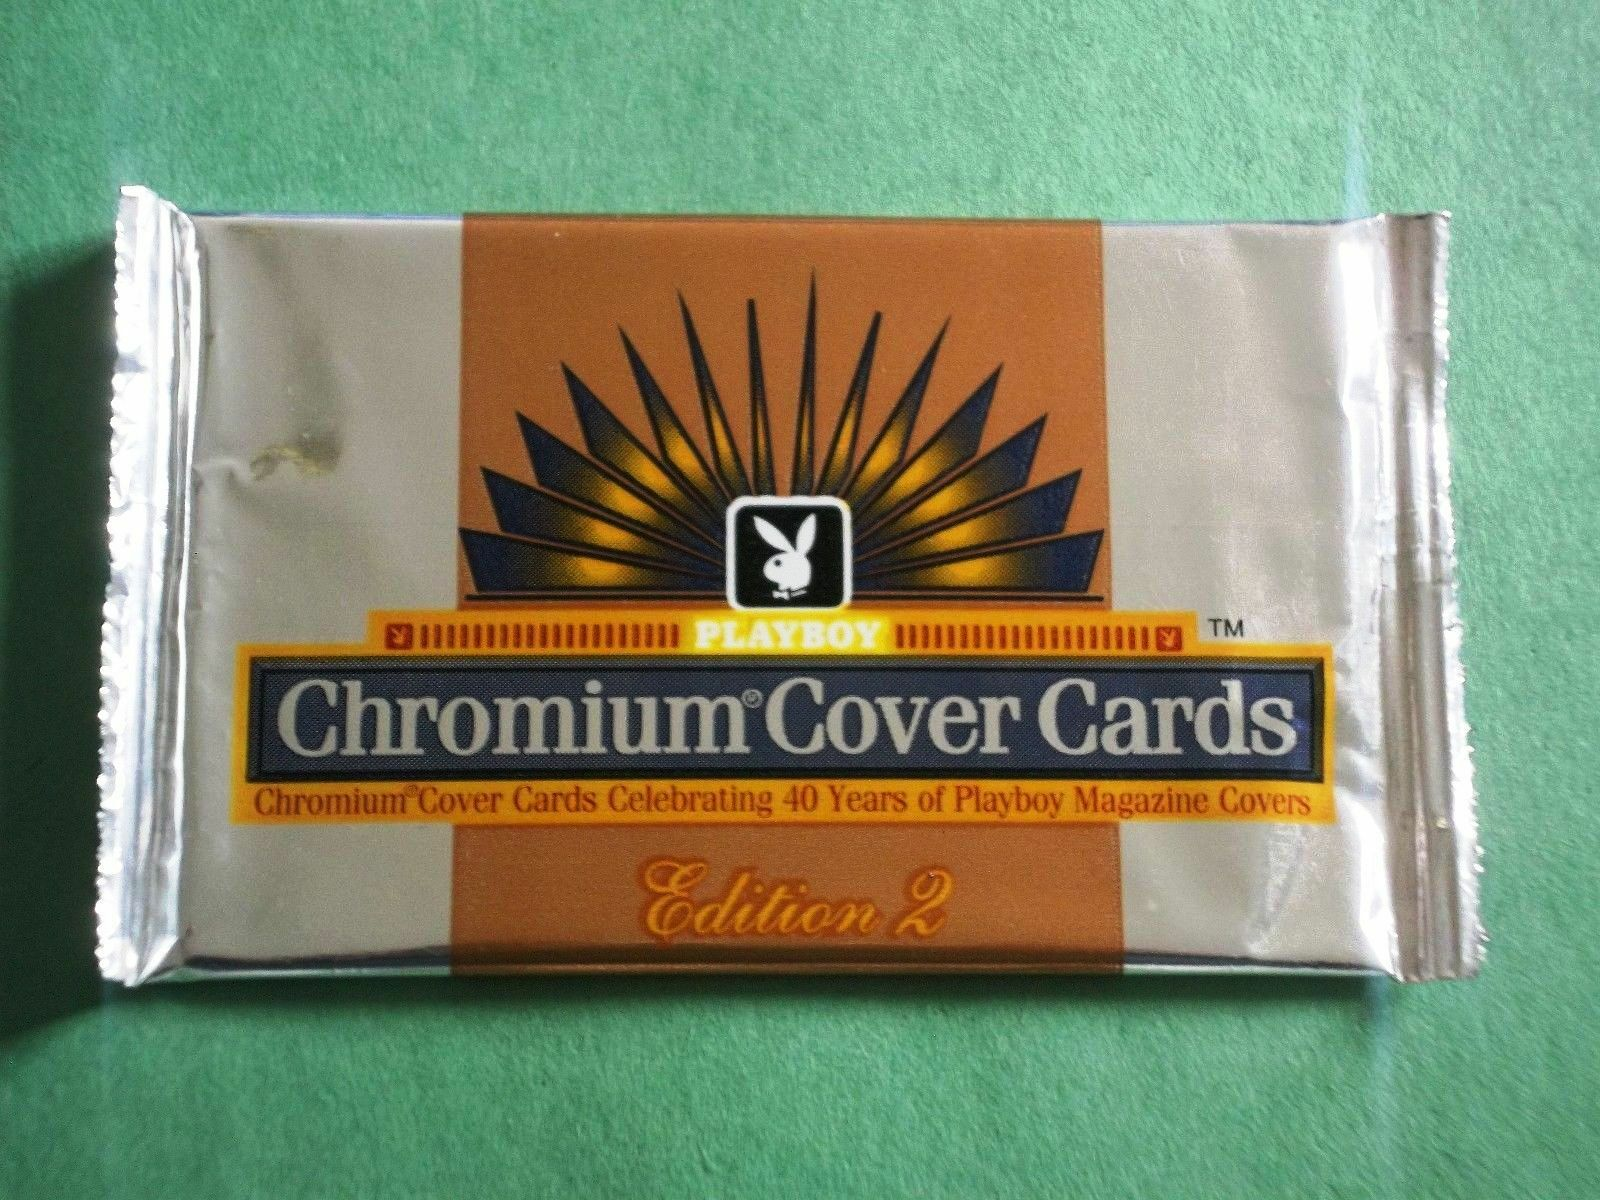 🔥 1995 Playboy Chromium Cover Edition 2 Card Pack - Hugh Hefner Signed? Auto?